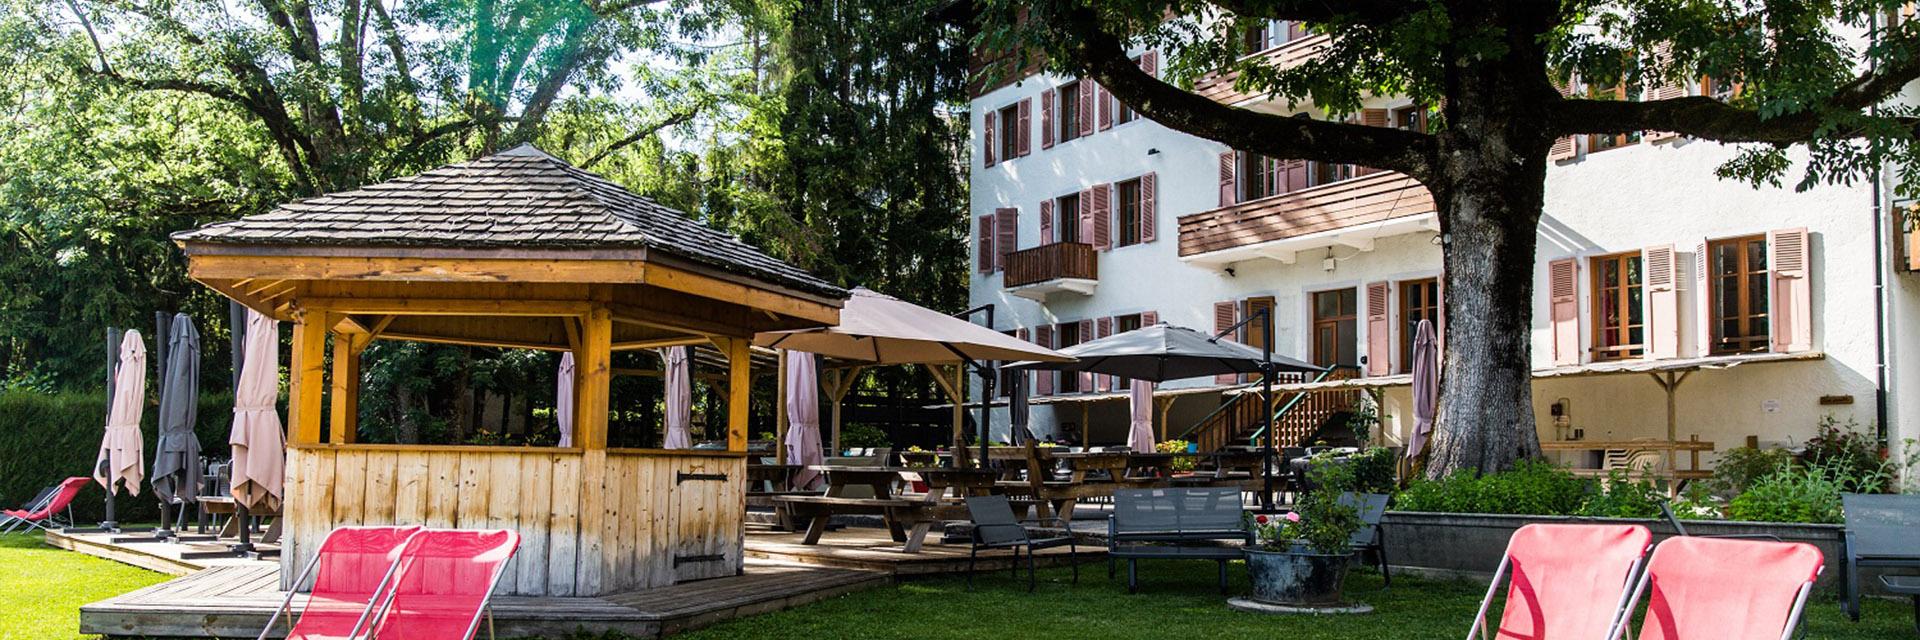 Village_club_vacances_haute-savoie_Berouze-village